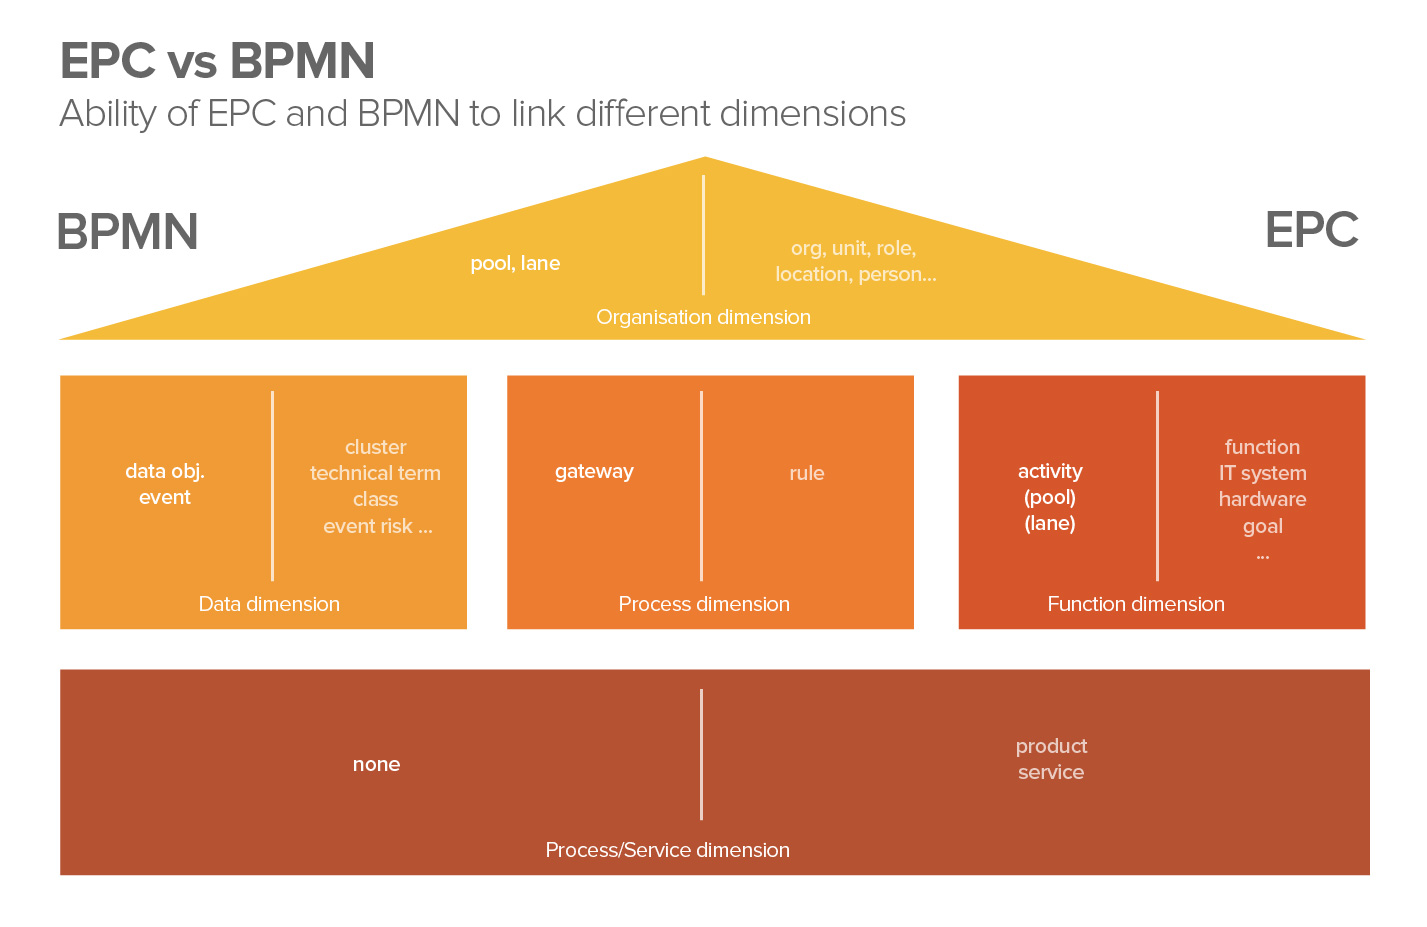 http://www.ariscommunity.com/users/sstein/2010-04-15-epc-vs-bpmn-perfect-flamewar